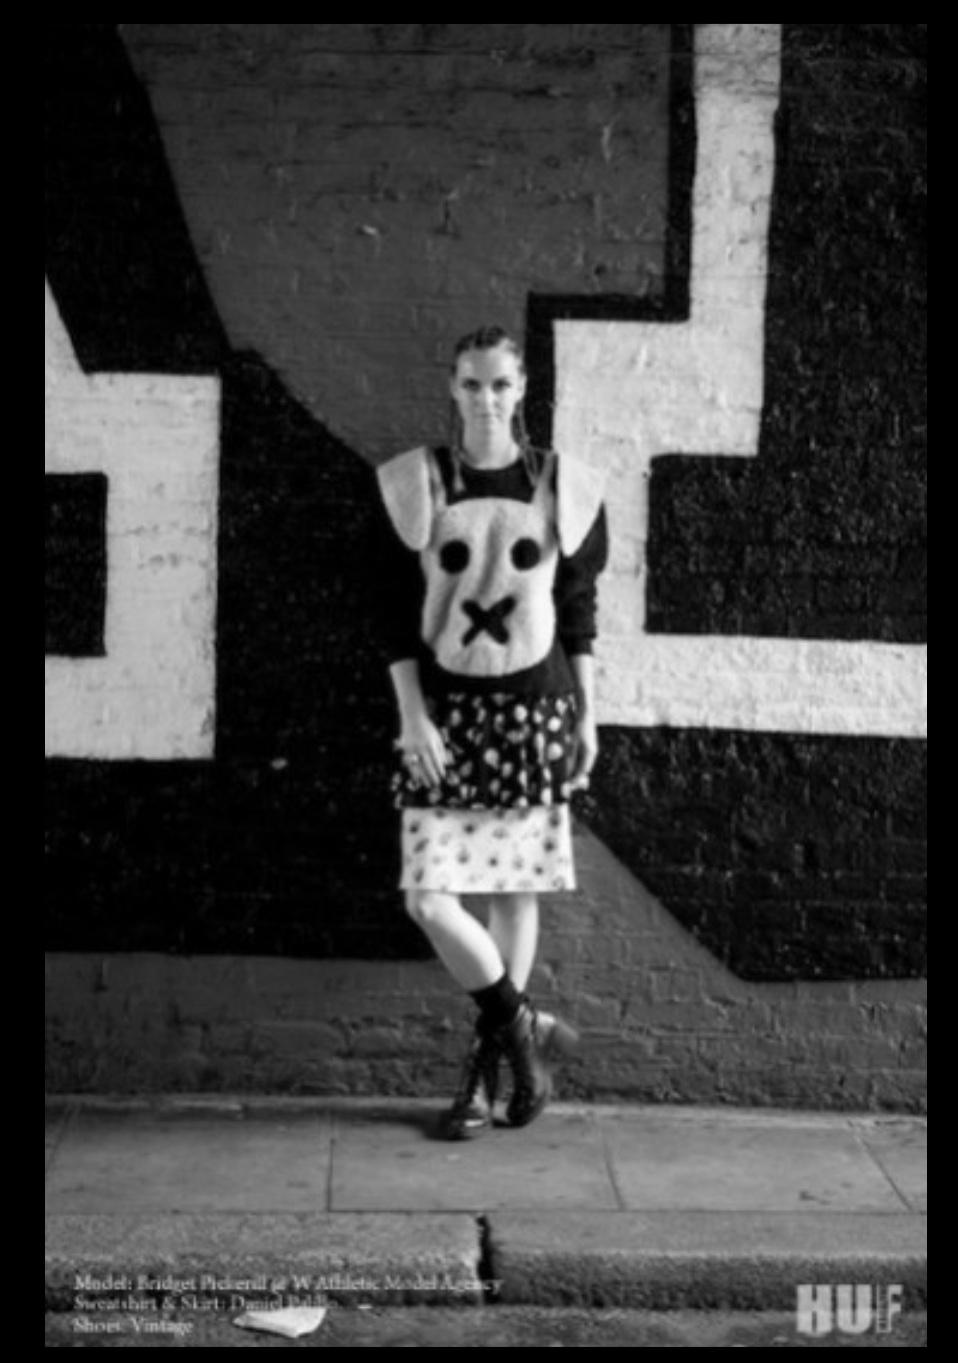 Street Style Photoshoot for HUF magazine 8